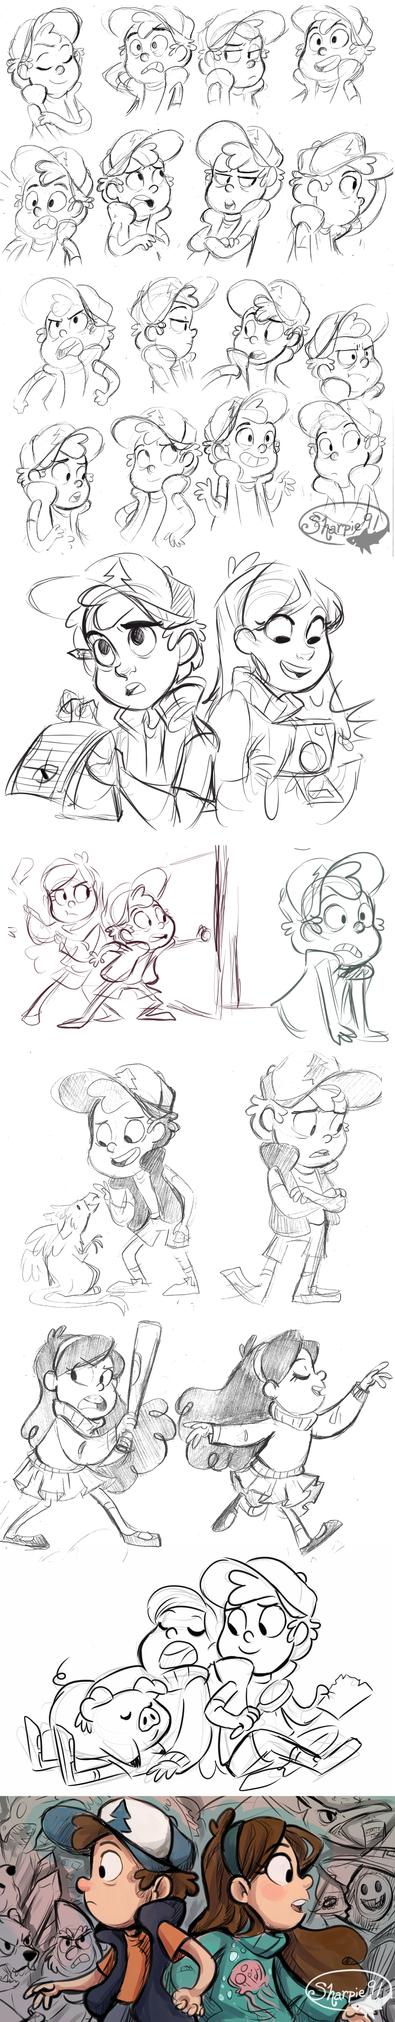 Gravity Falls Stuff 2 by sharkie19